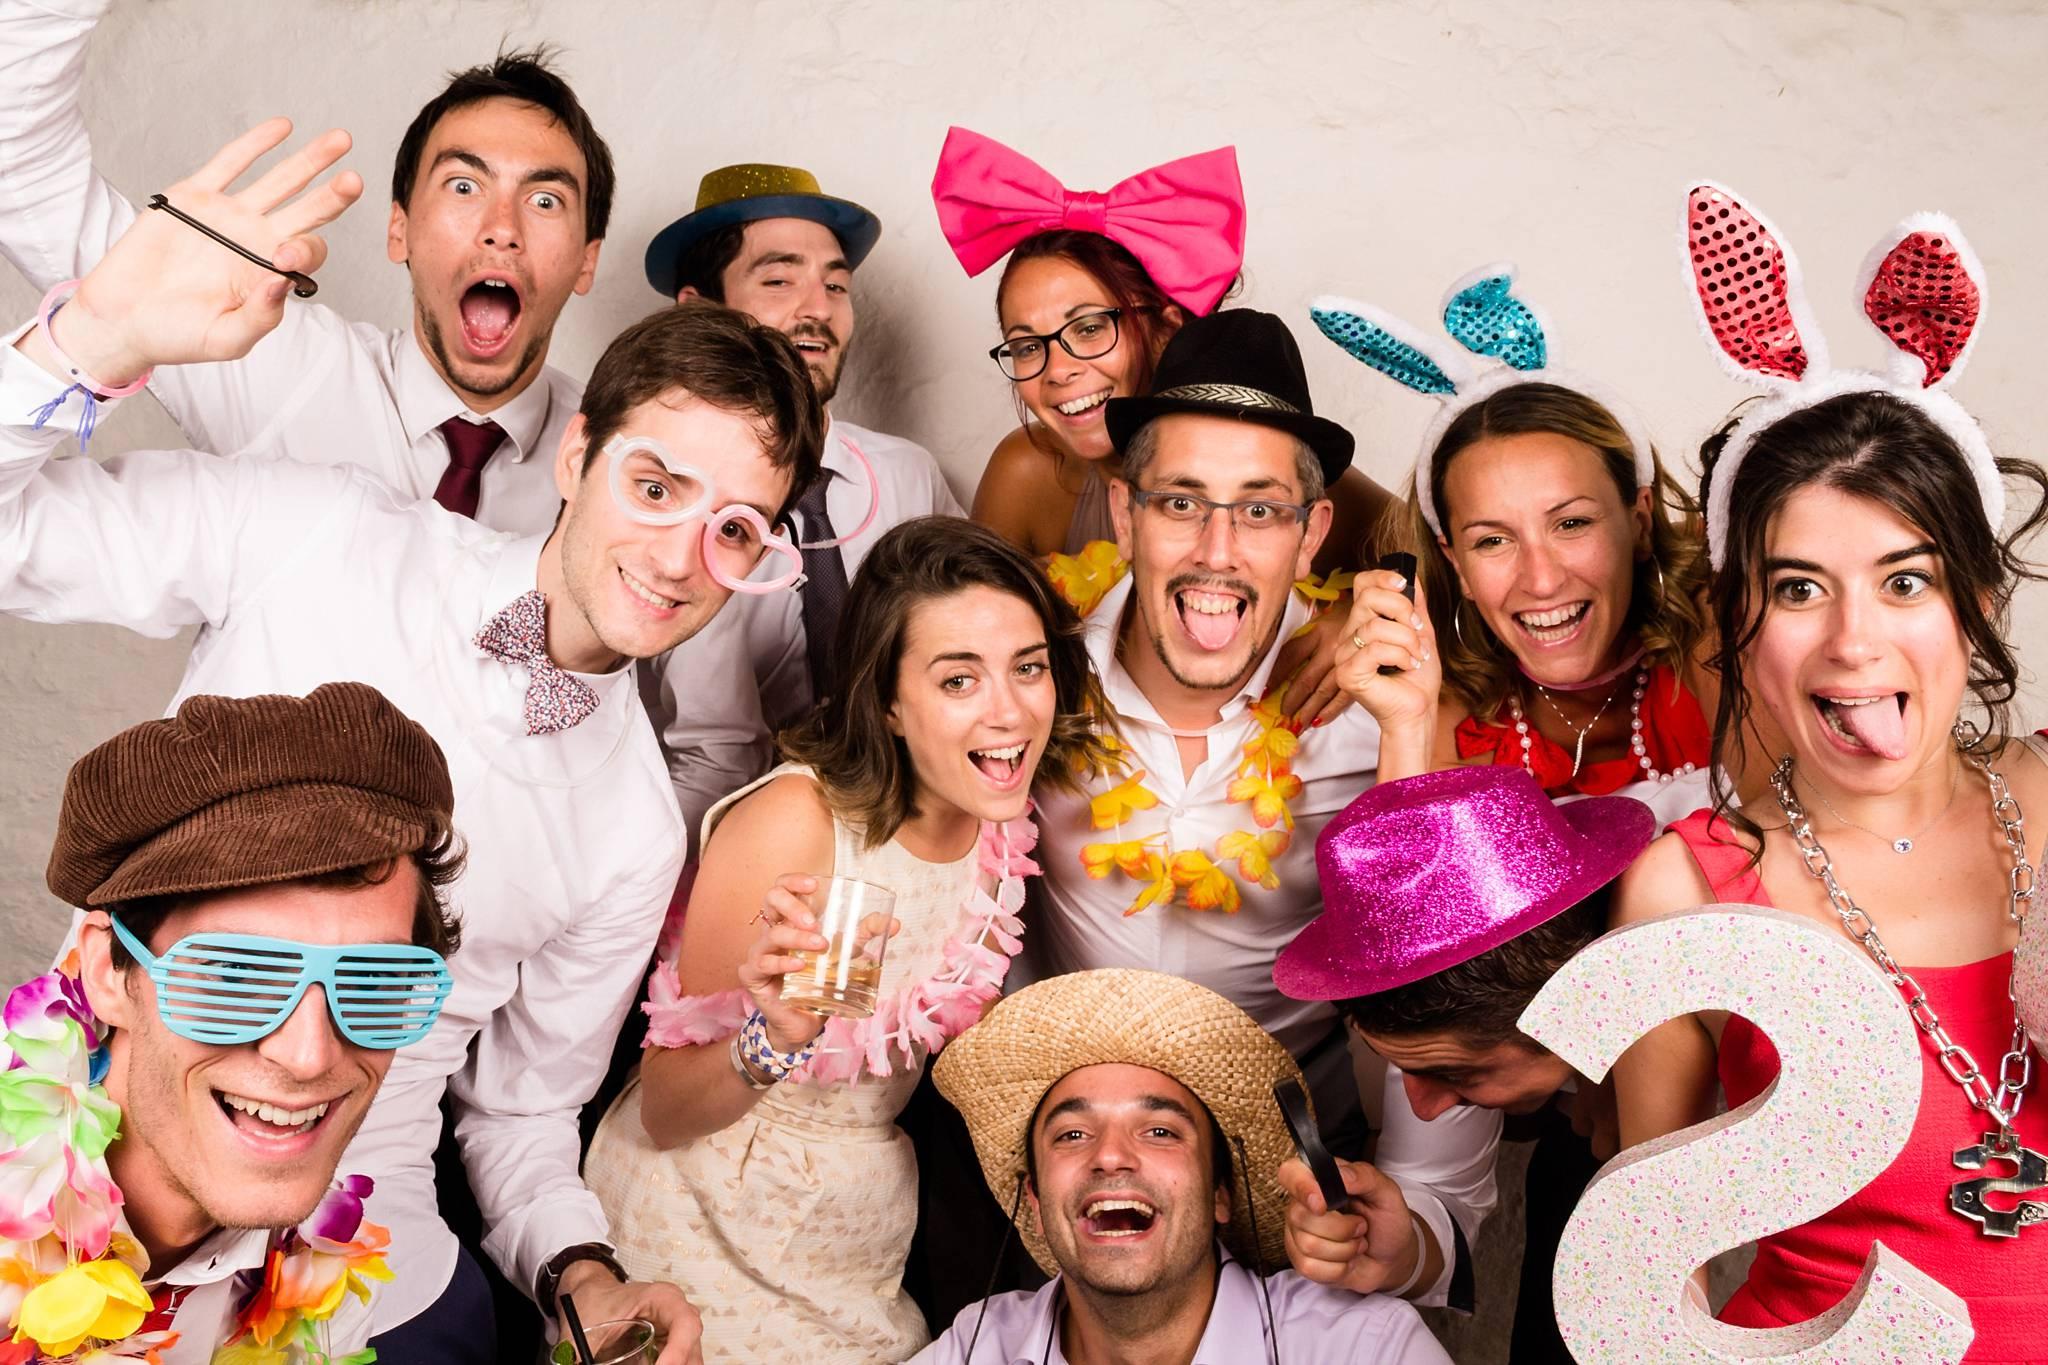 23_photobooth-mariage-bordeaux-gironde-dordogne-charentes-alexandre-roschewitz-photographies_2048px